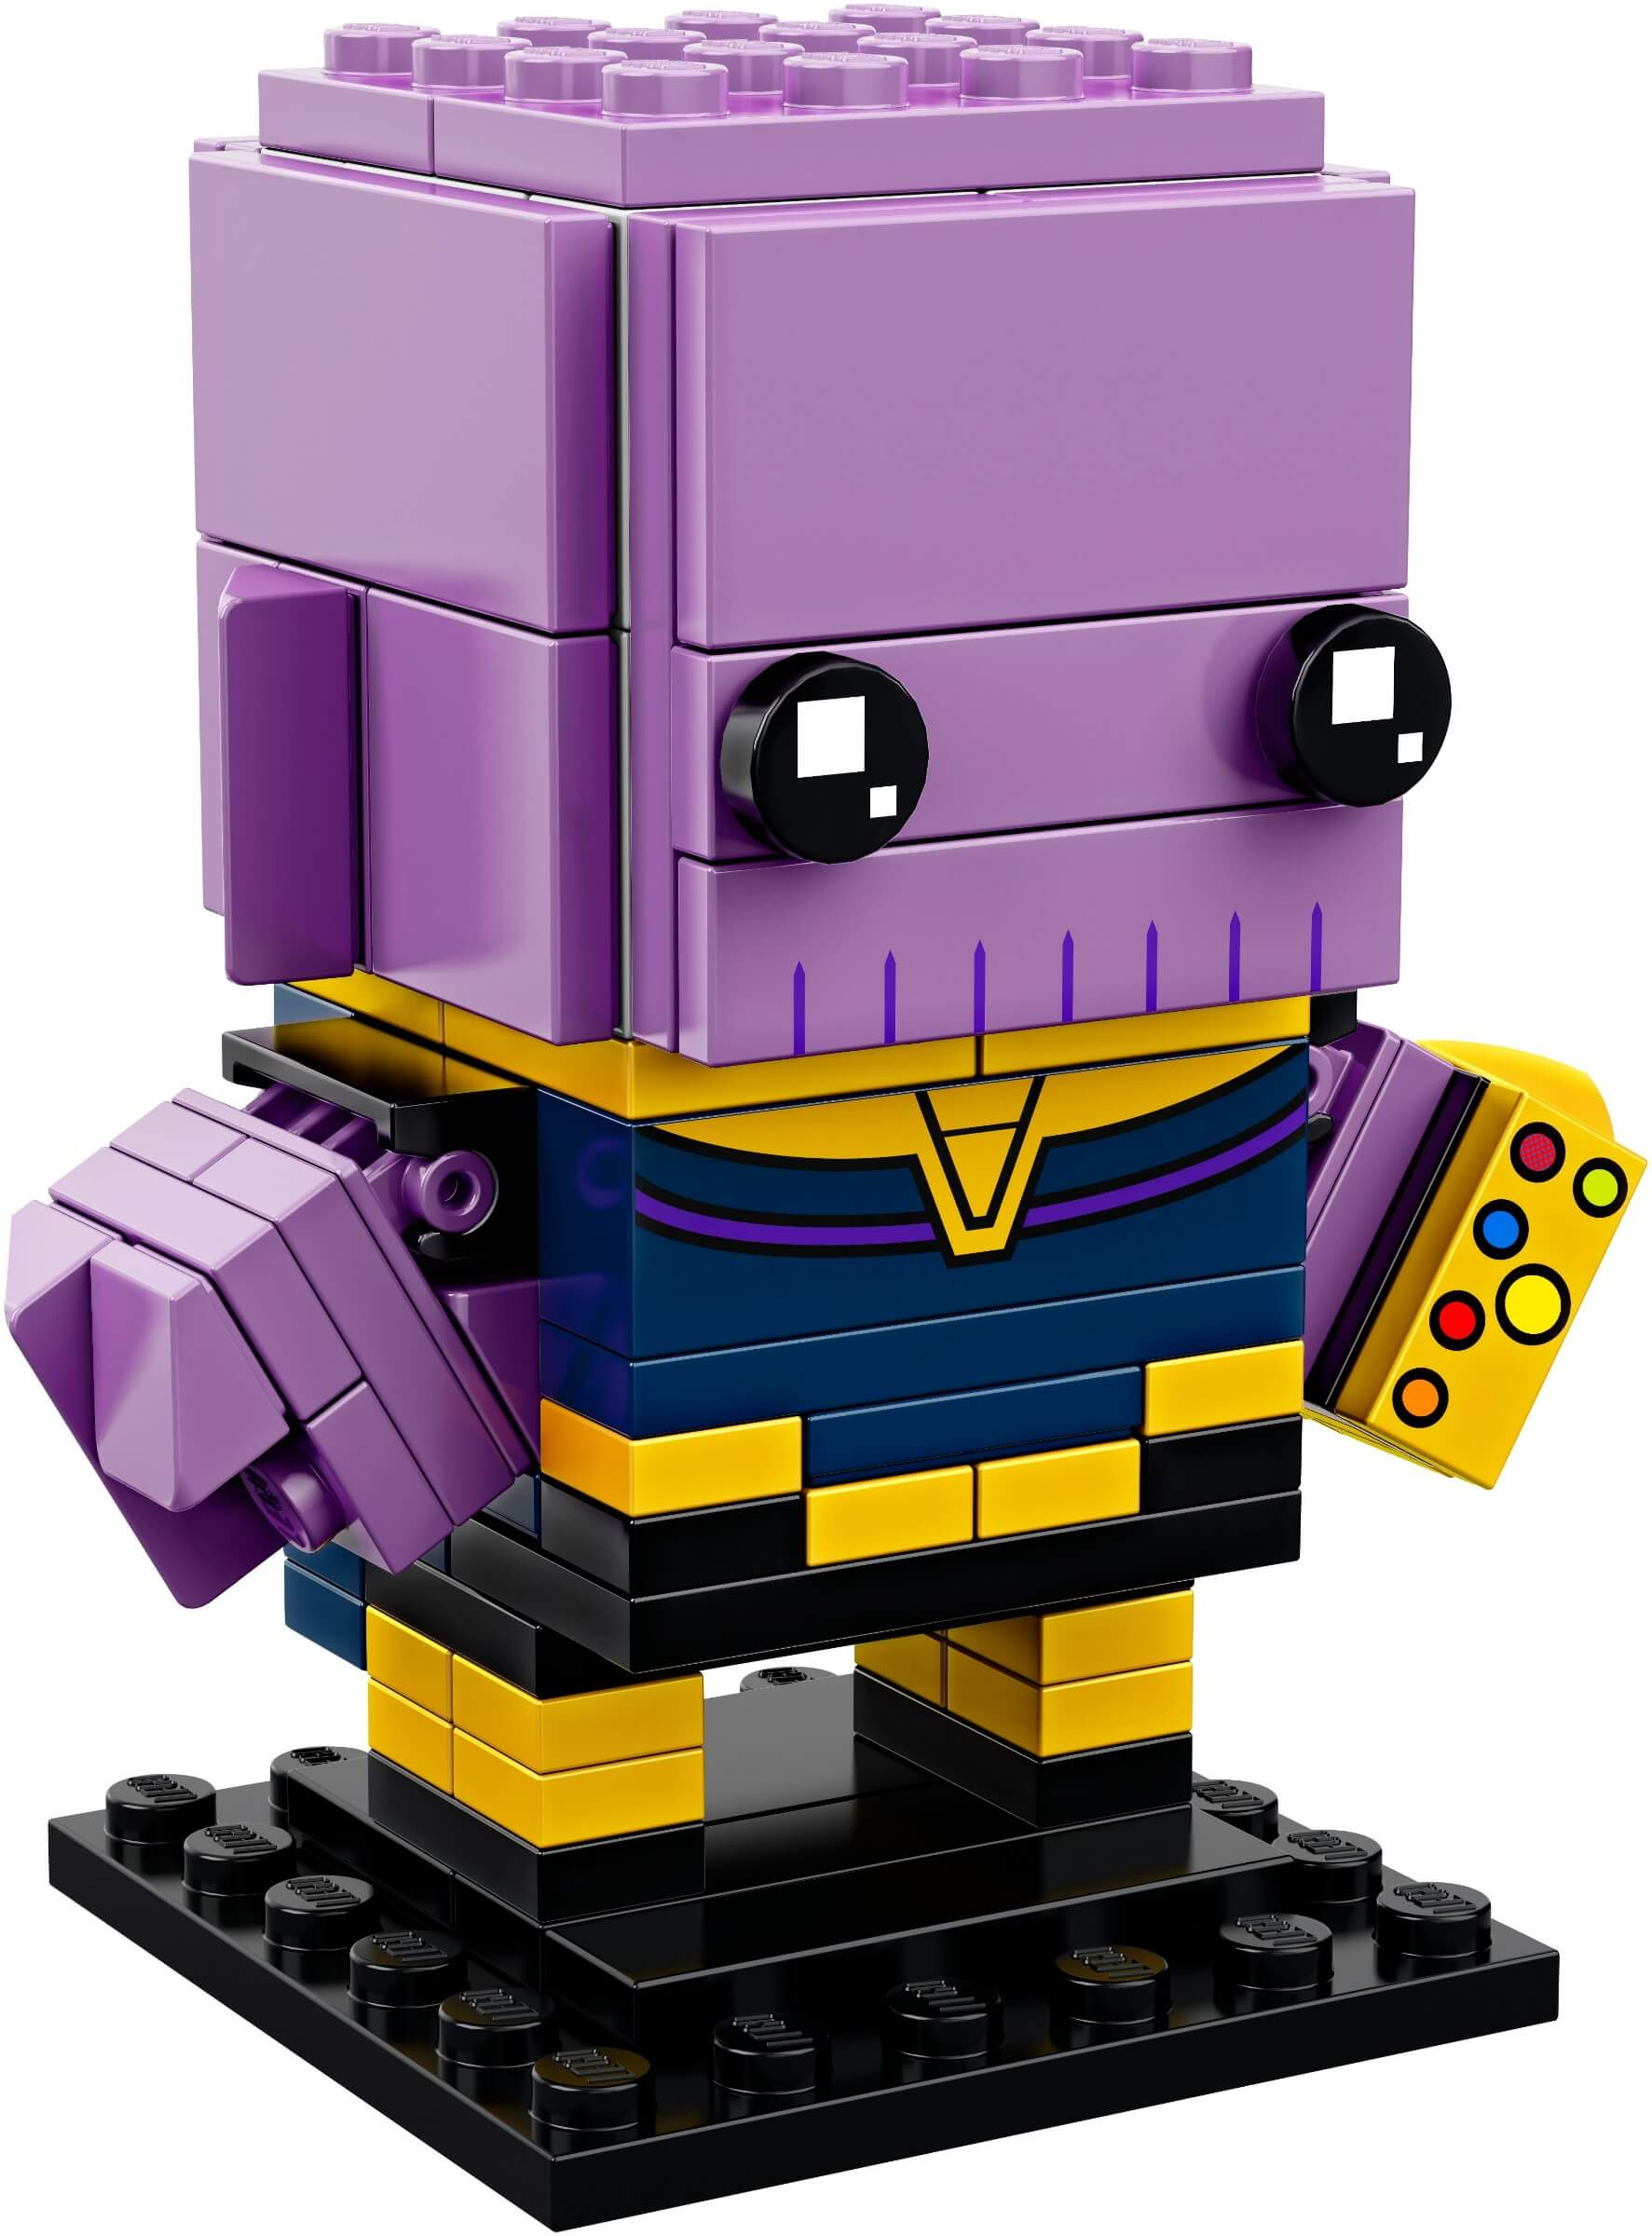 Mua đồ chơi LEGO 41605 - LEGO Super Heroes 41605 - Thanos (LEGO 41605 Thanos)